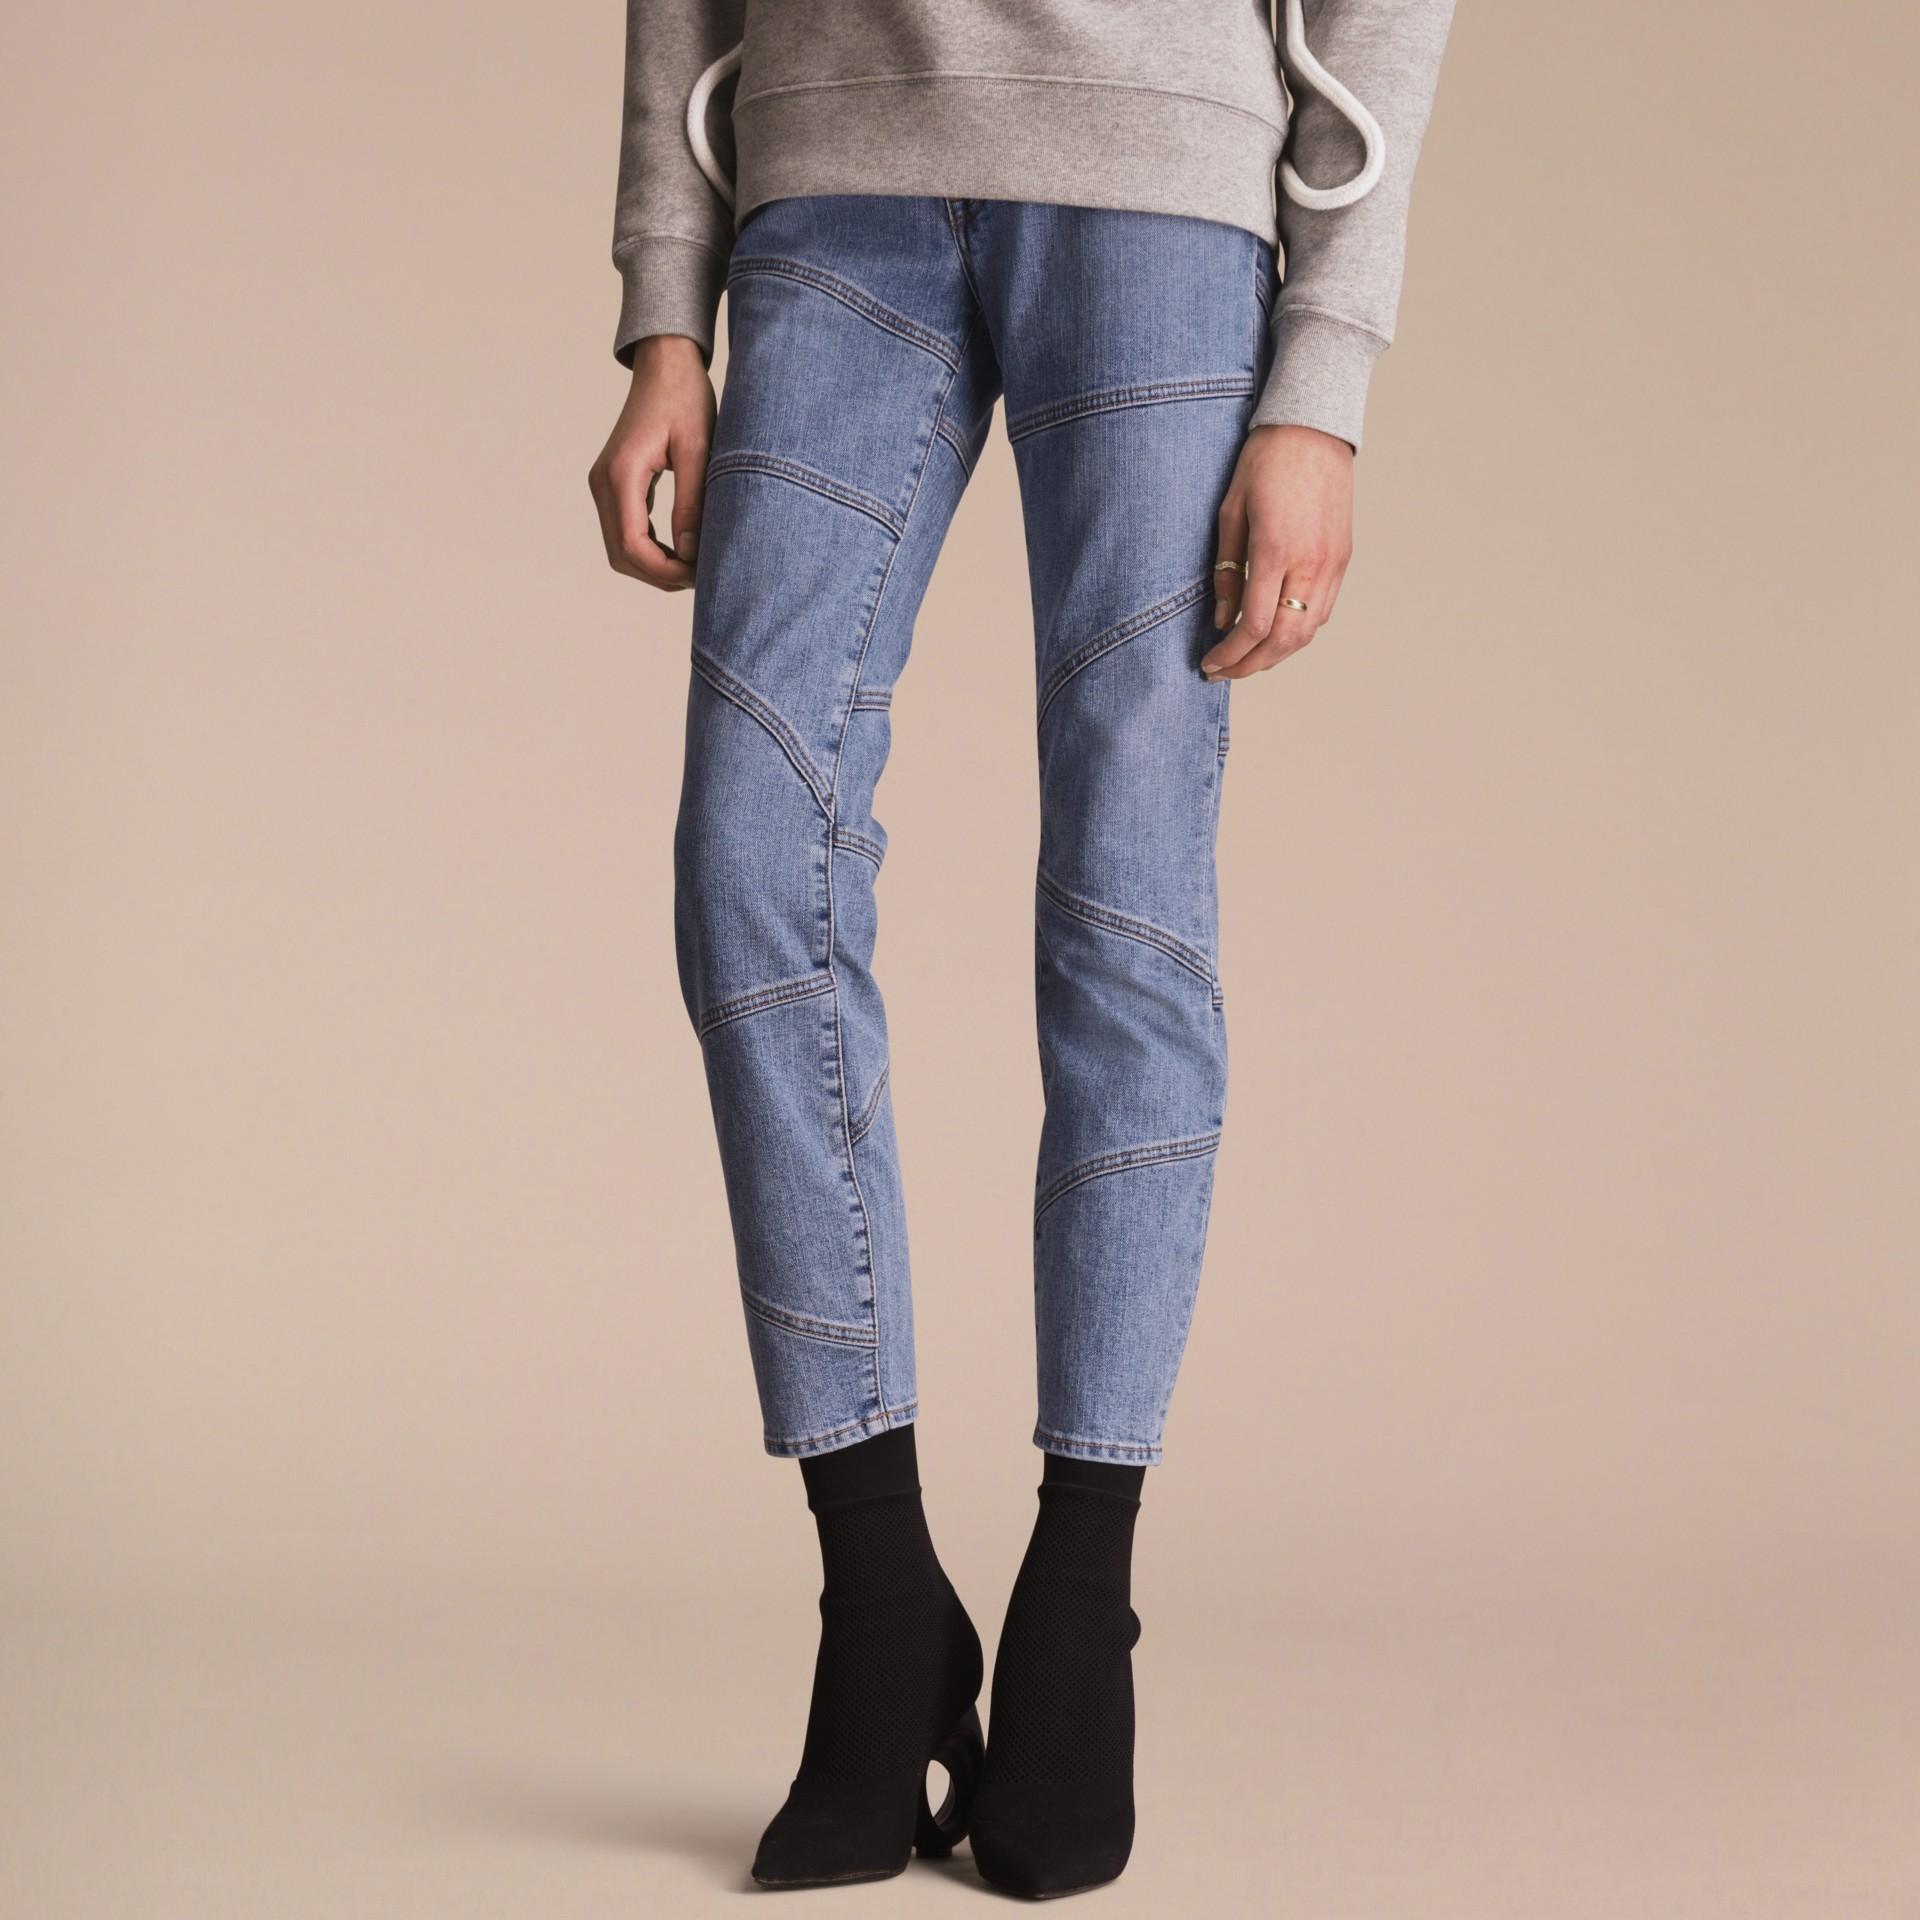 Slim Fit Seam Detail Japanese Denim Jeans - gallery image 7